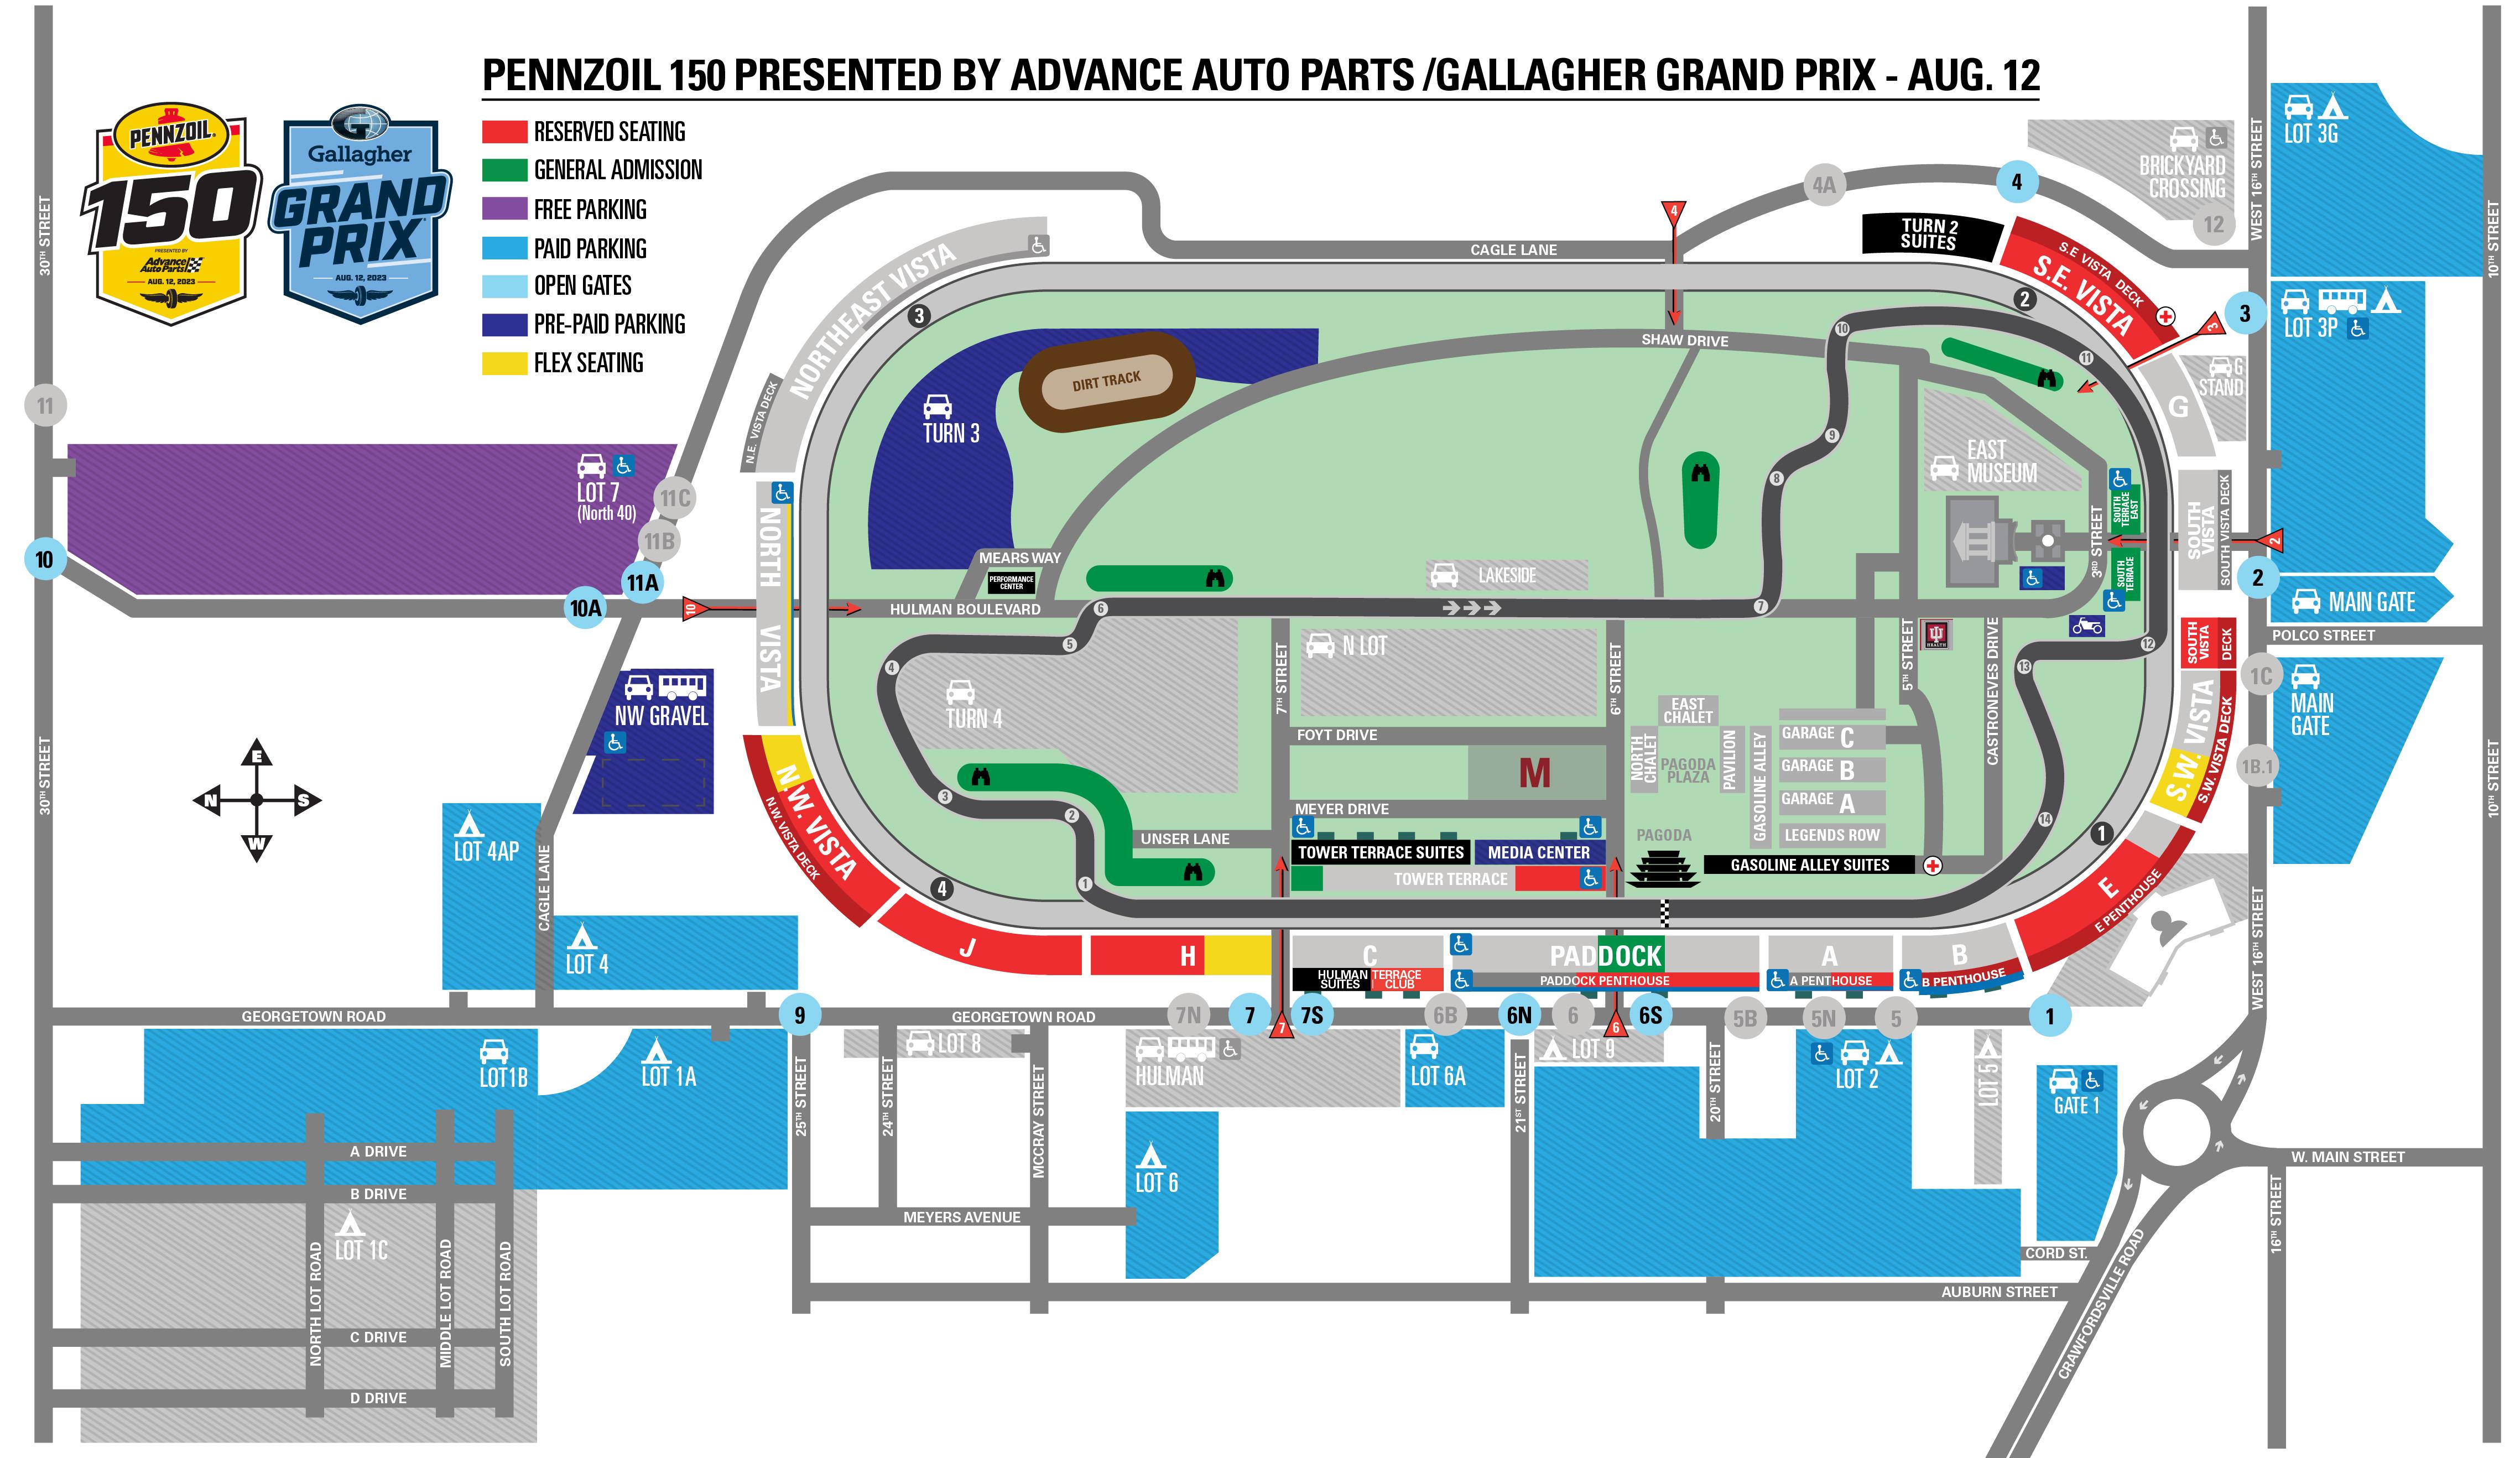 INDYCAR/XFINITY Doubleheader Race Day Map